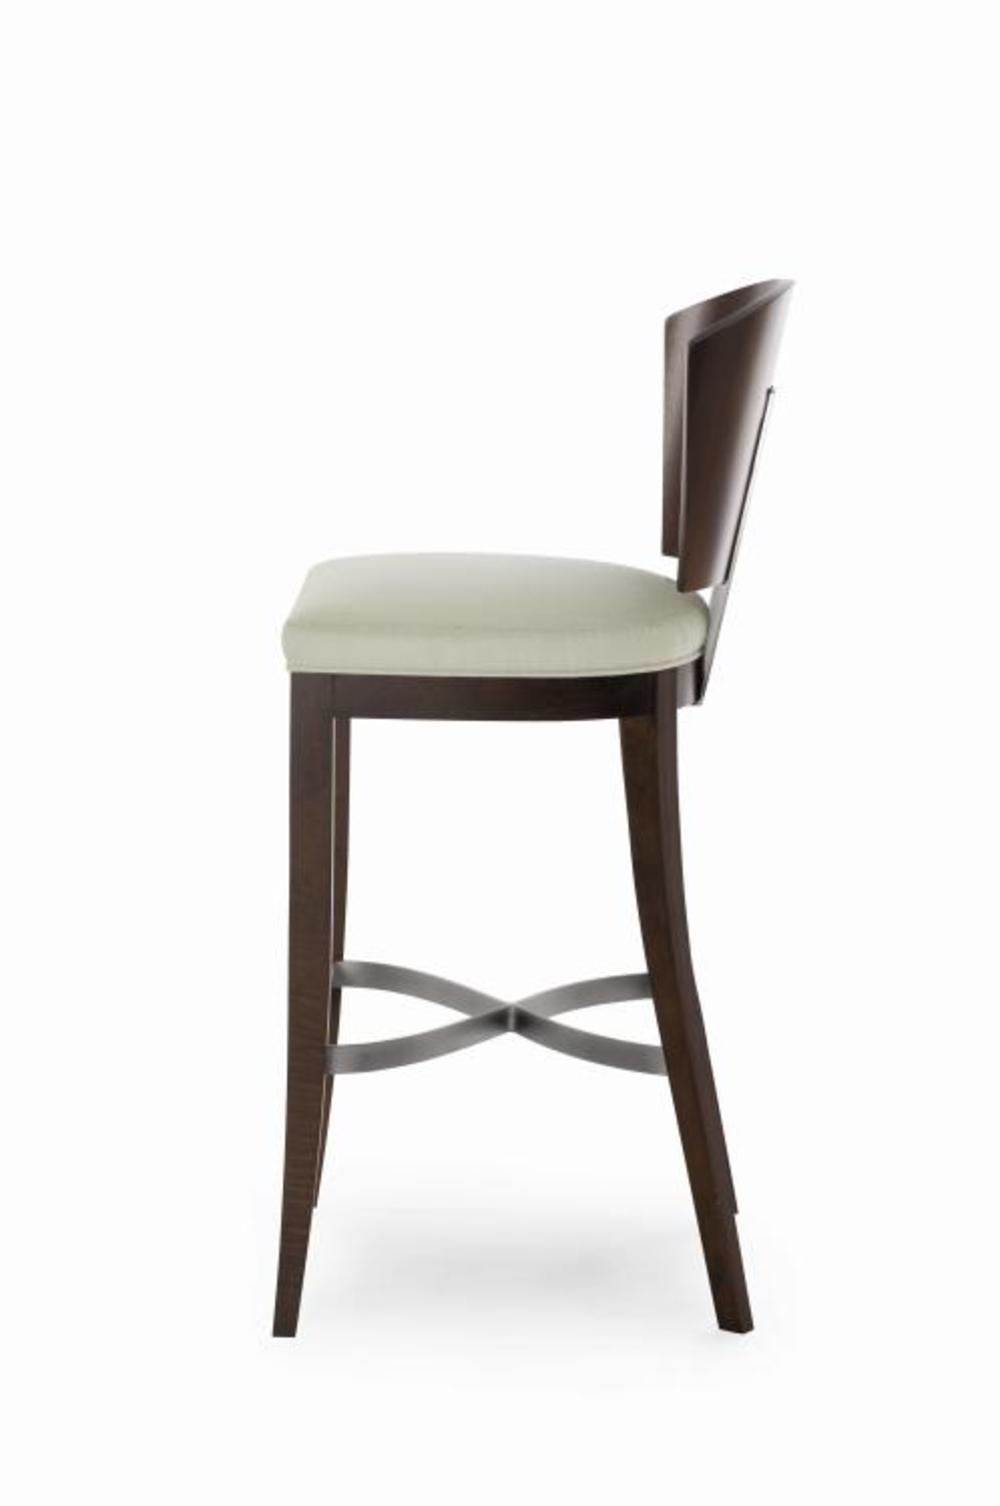 Century Furniture - Paragon Club Slipstream Counter Stool